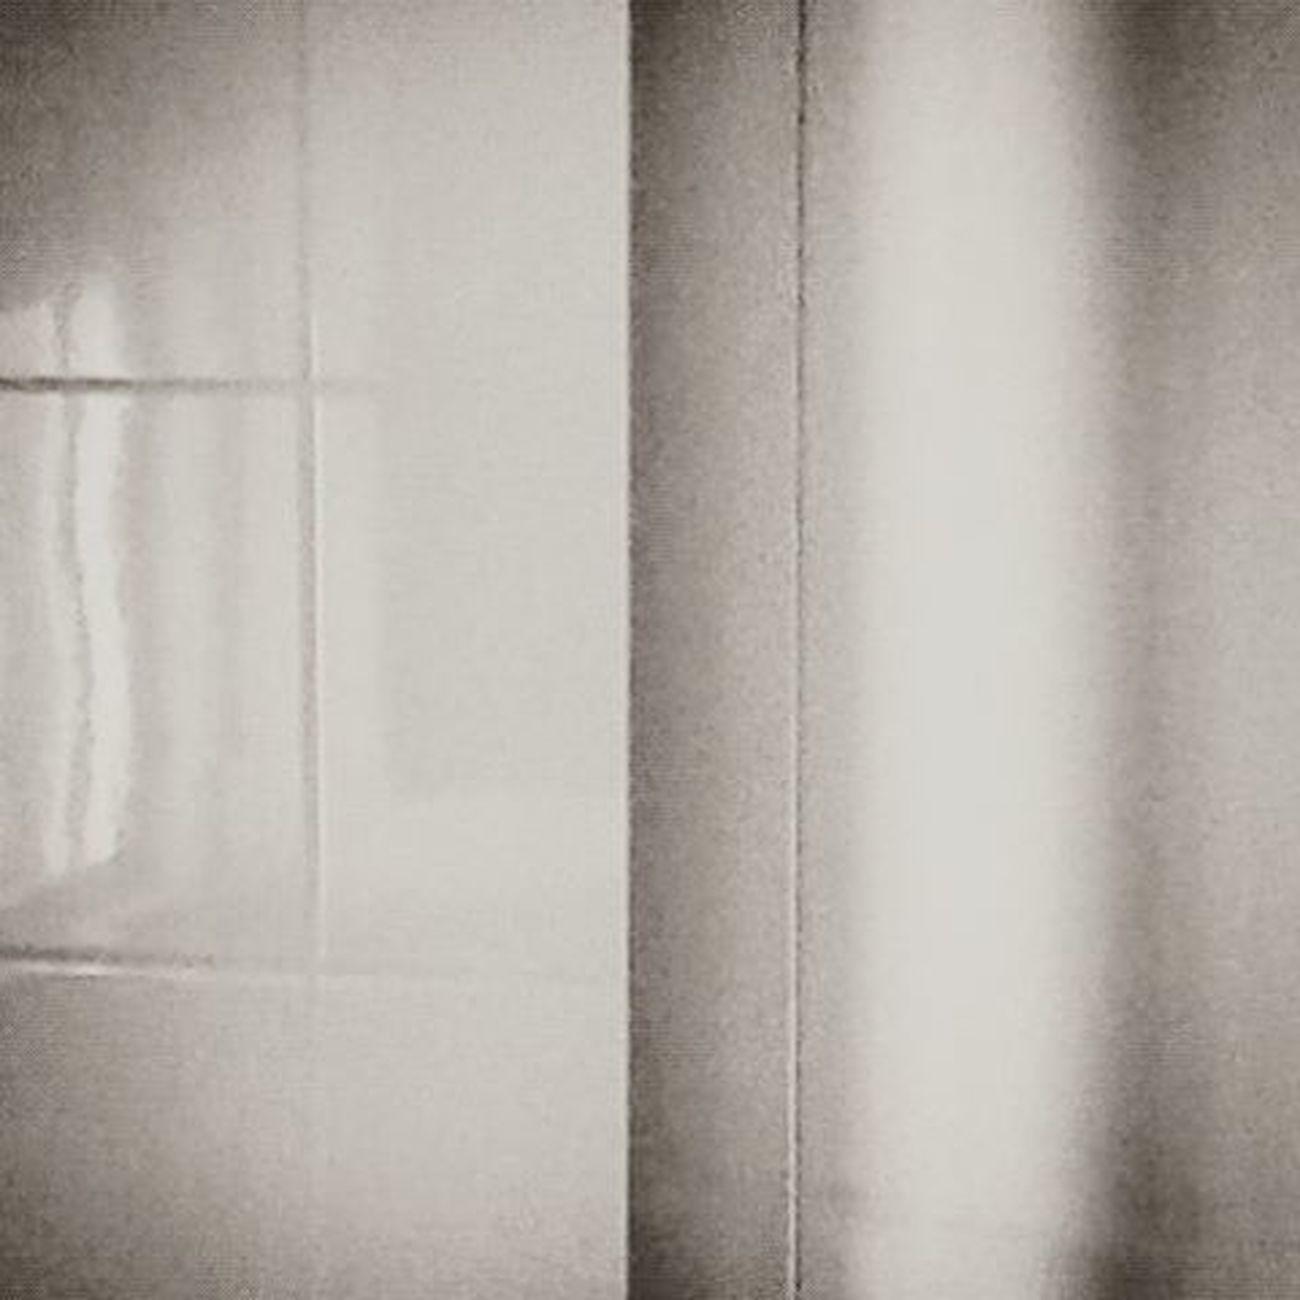 Realidad e ilusión. Realidadeilusion Realityandillusion Monochrome Psiconauta psychonaut nomada paisajeinterior paisajemental innerlandscape mindscape minimal